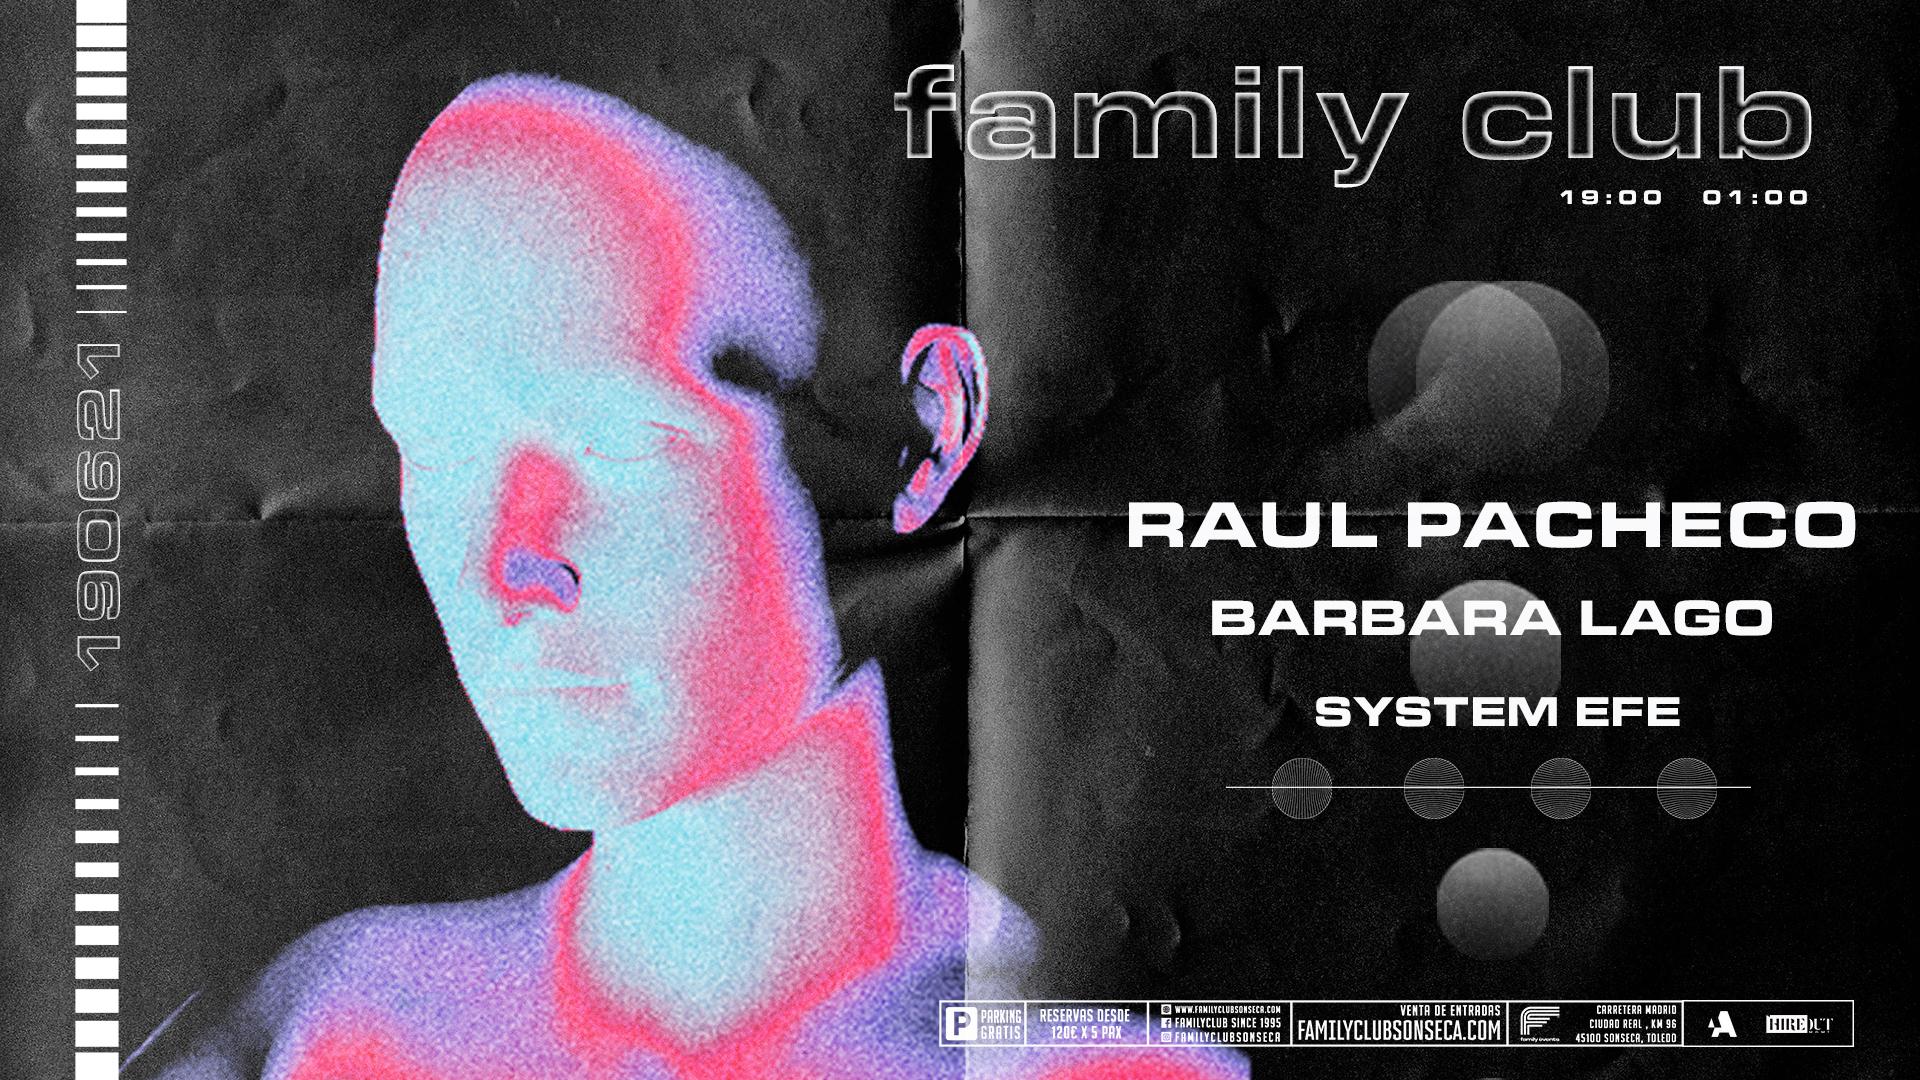 Raul Pacheco y Bárbara Lago - FAMILY EVENTS